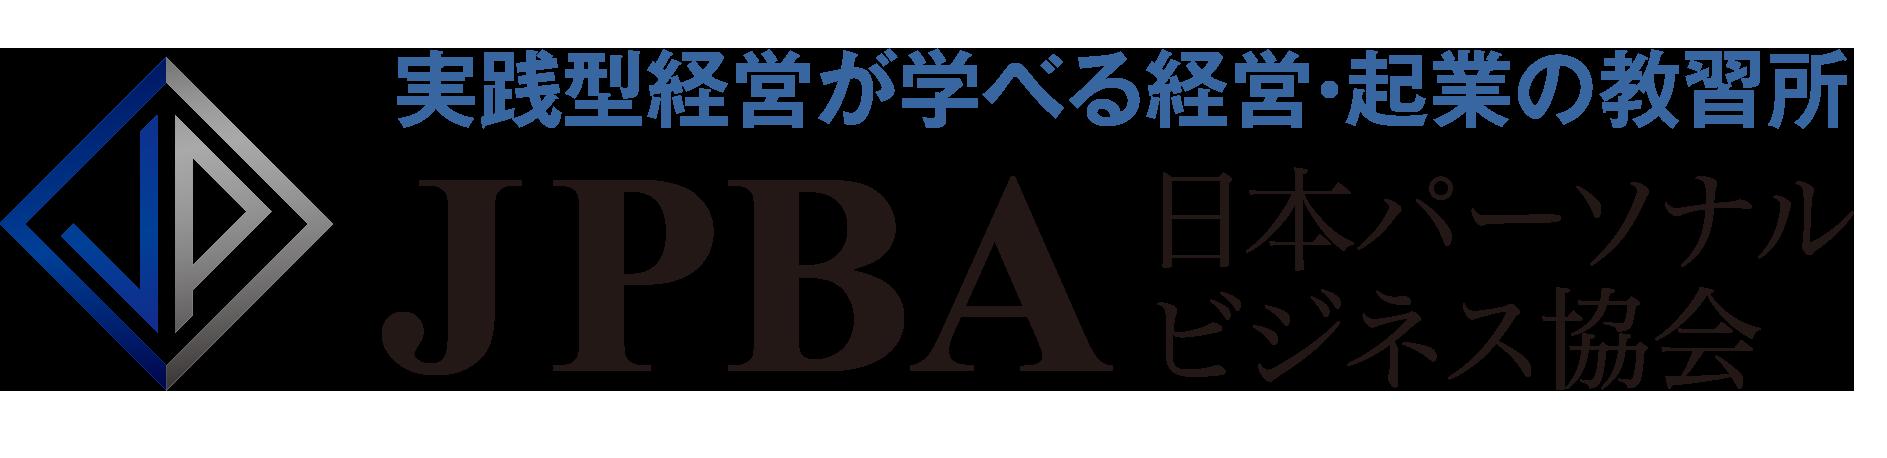 JPBA 一般社団法人 日本パーソナルビジネス協会 6か月で売上7倍の実績。会社・事業の経営力アップを支援!